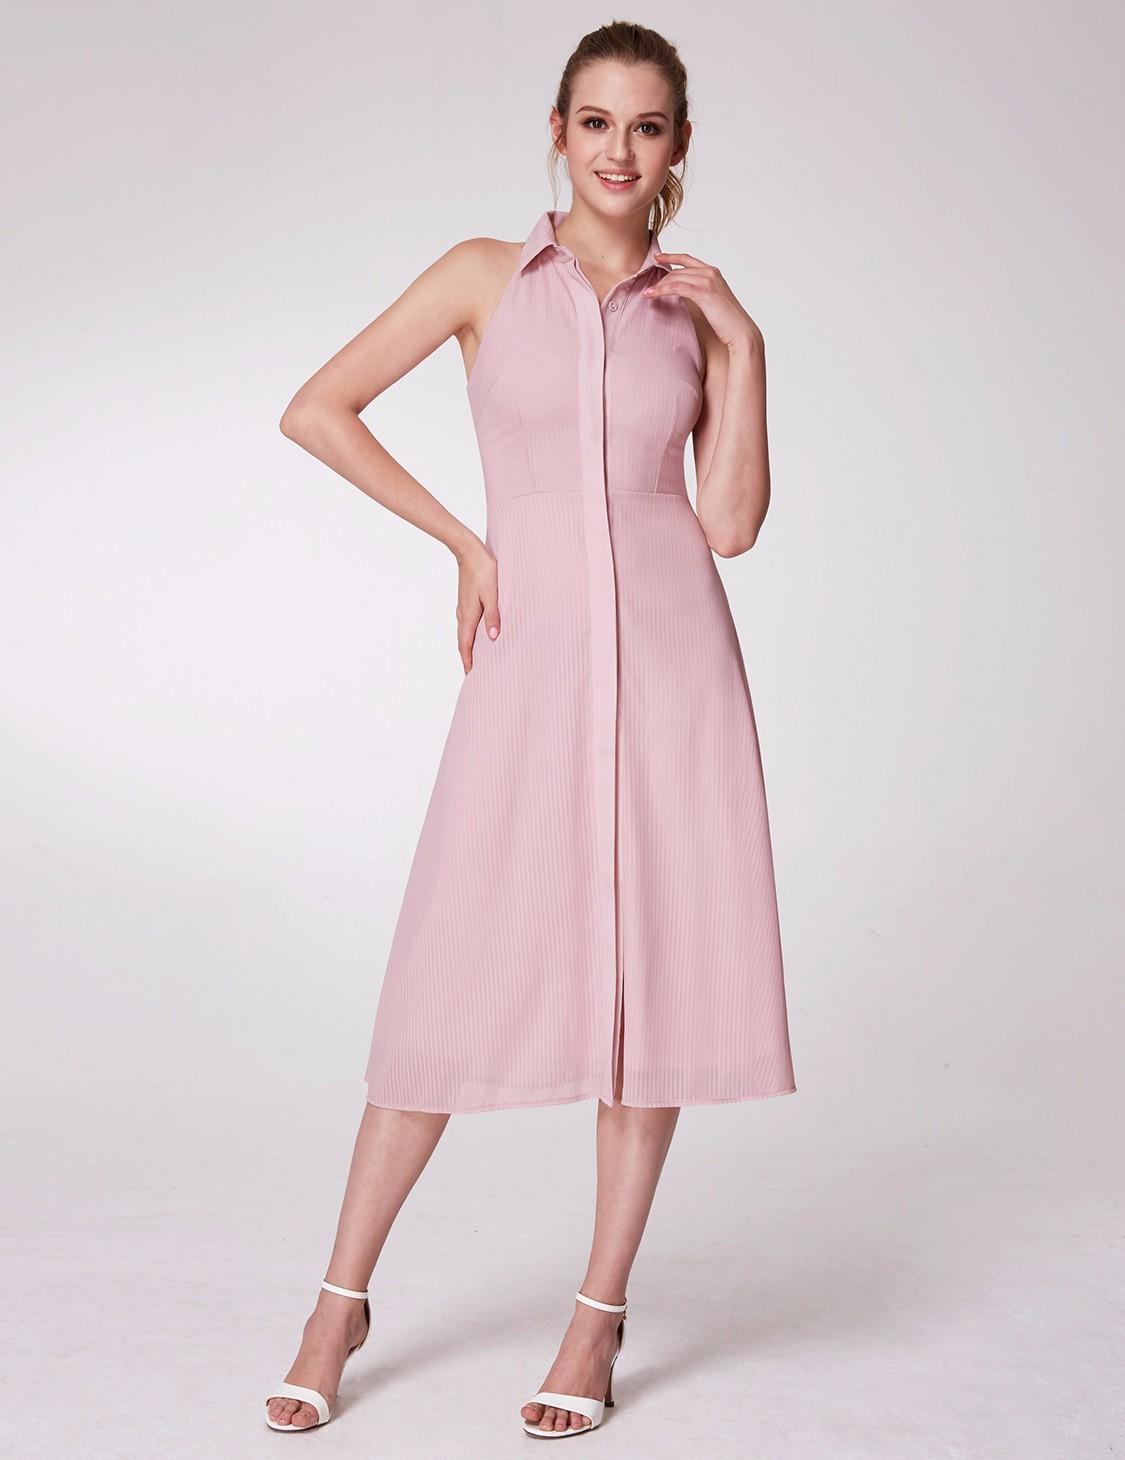 fe49849141f Alisa Pan Women s Pink Button Collar Sleeveless Casual Dresses a ...